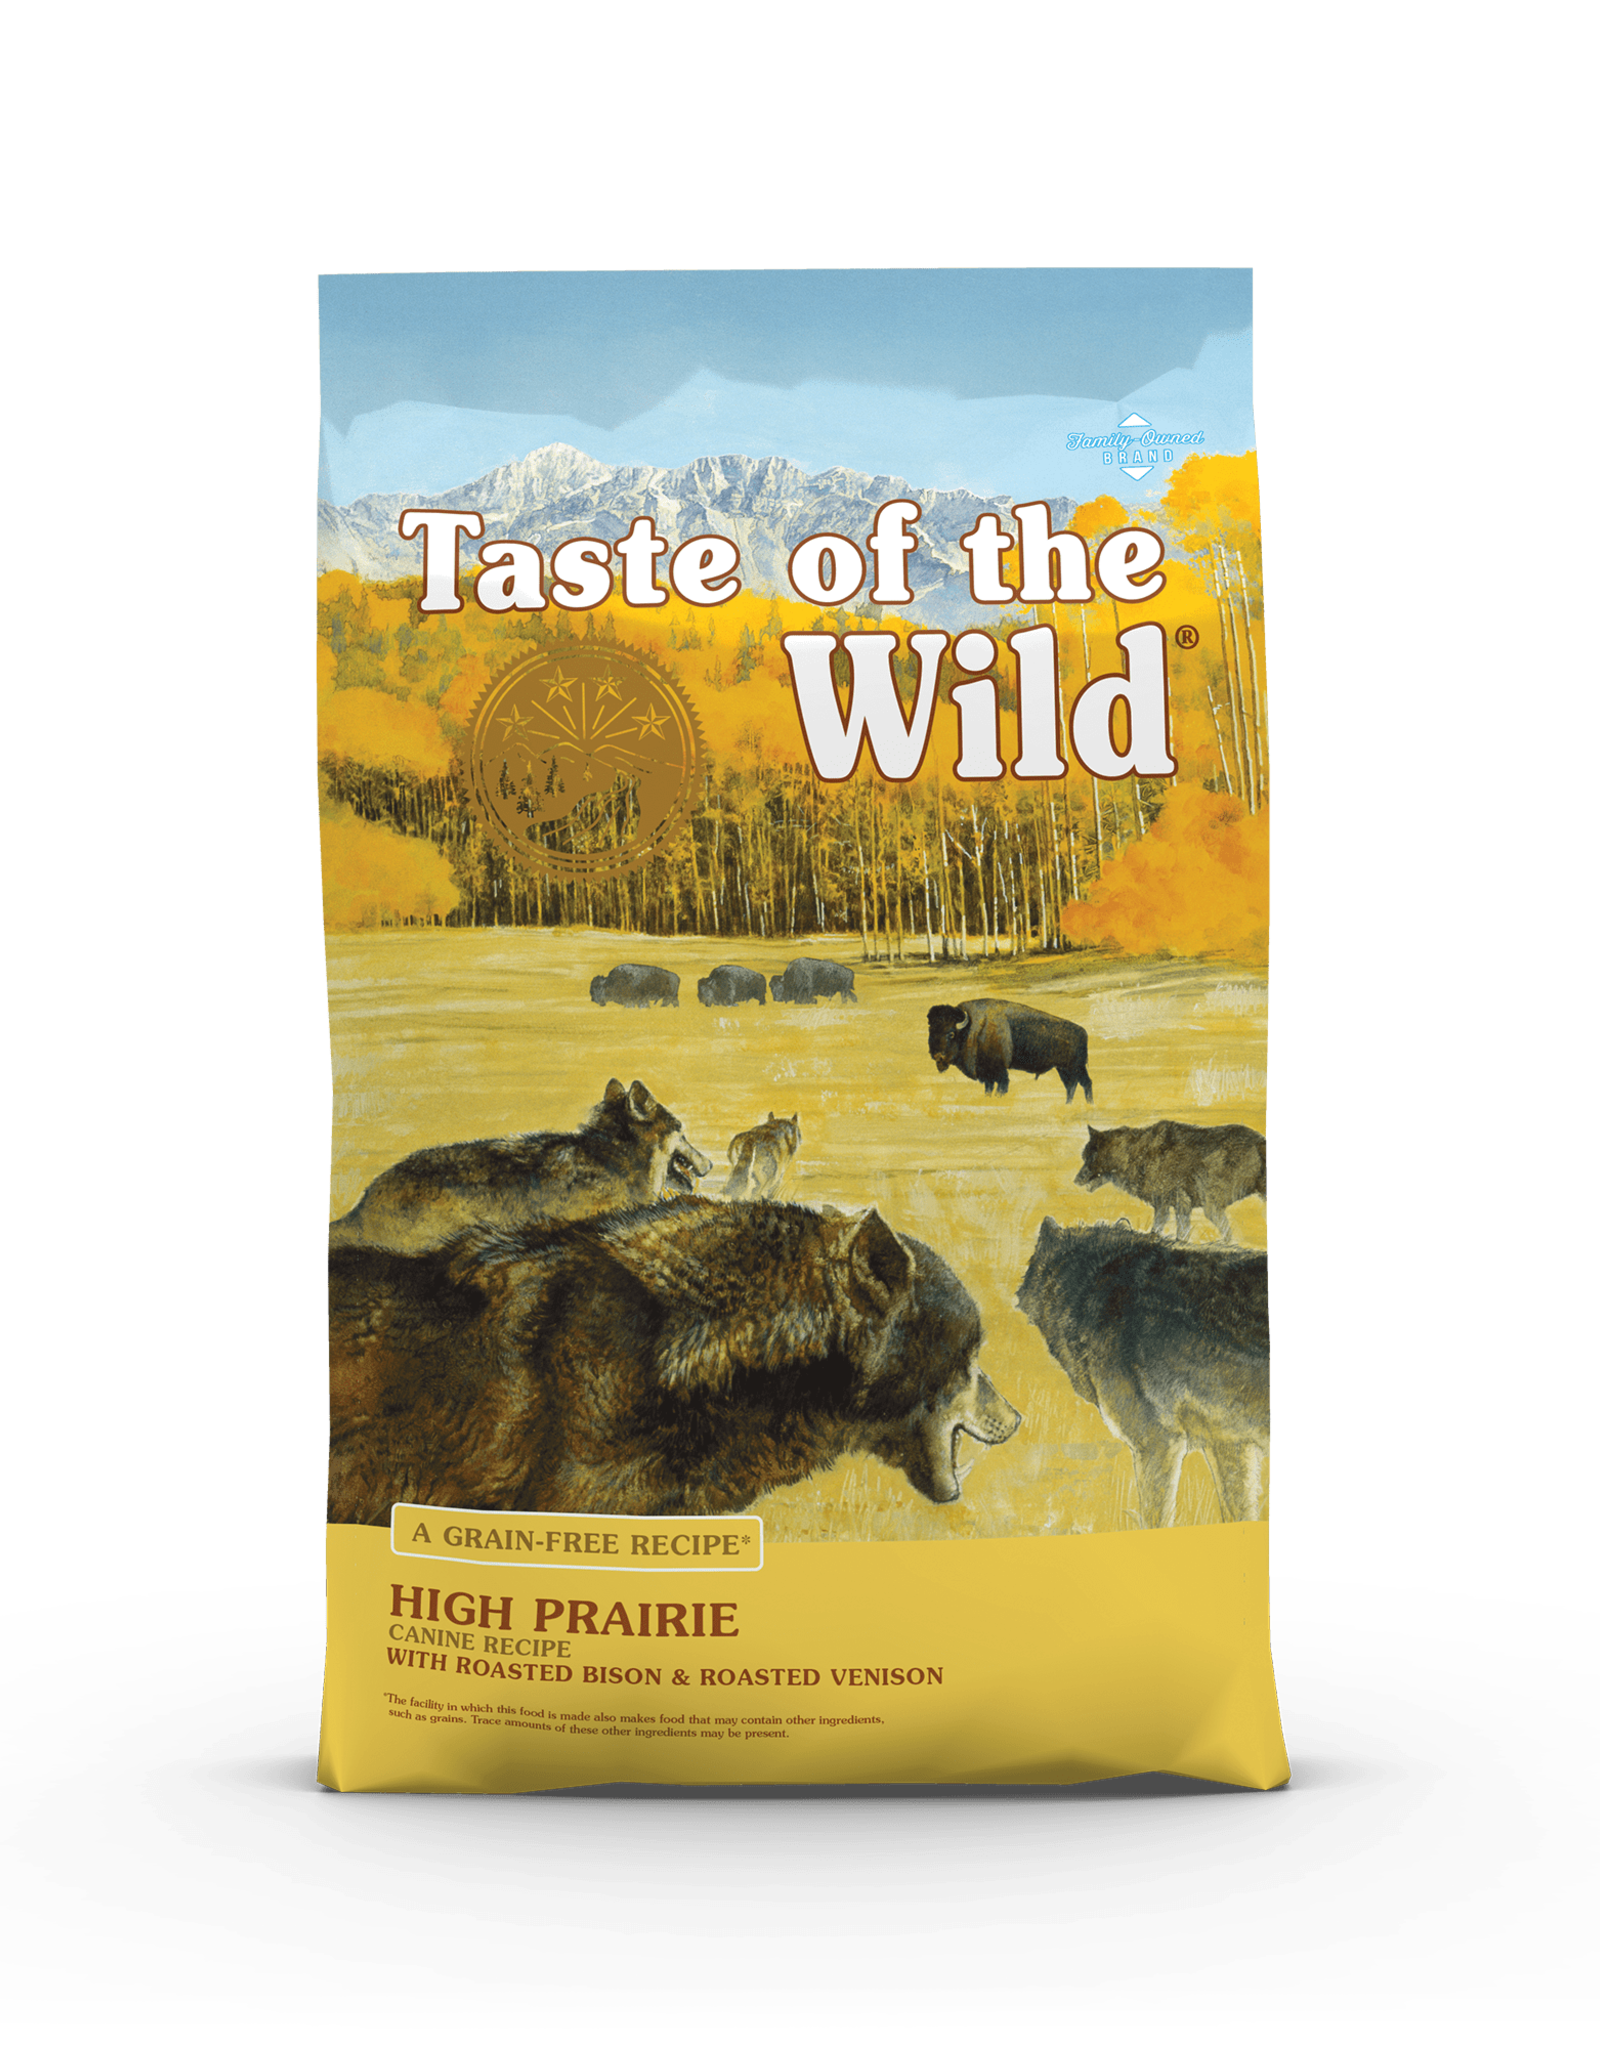 Taste of the Wild Pet Food Dog High Prairie Recipe - Grain-Free 28lb